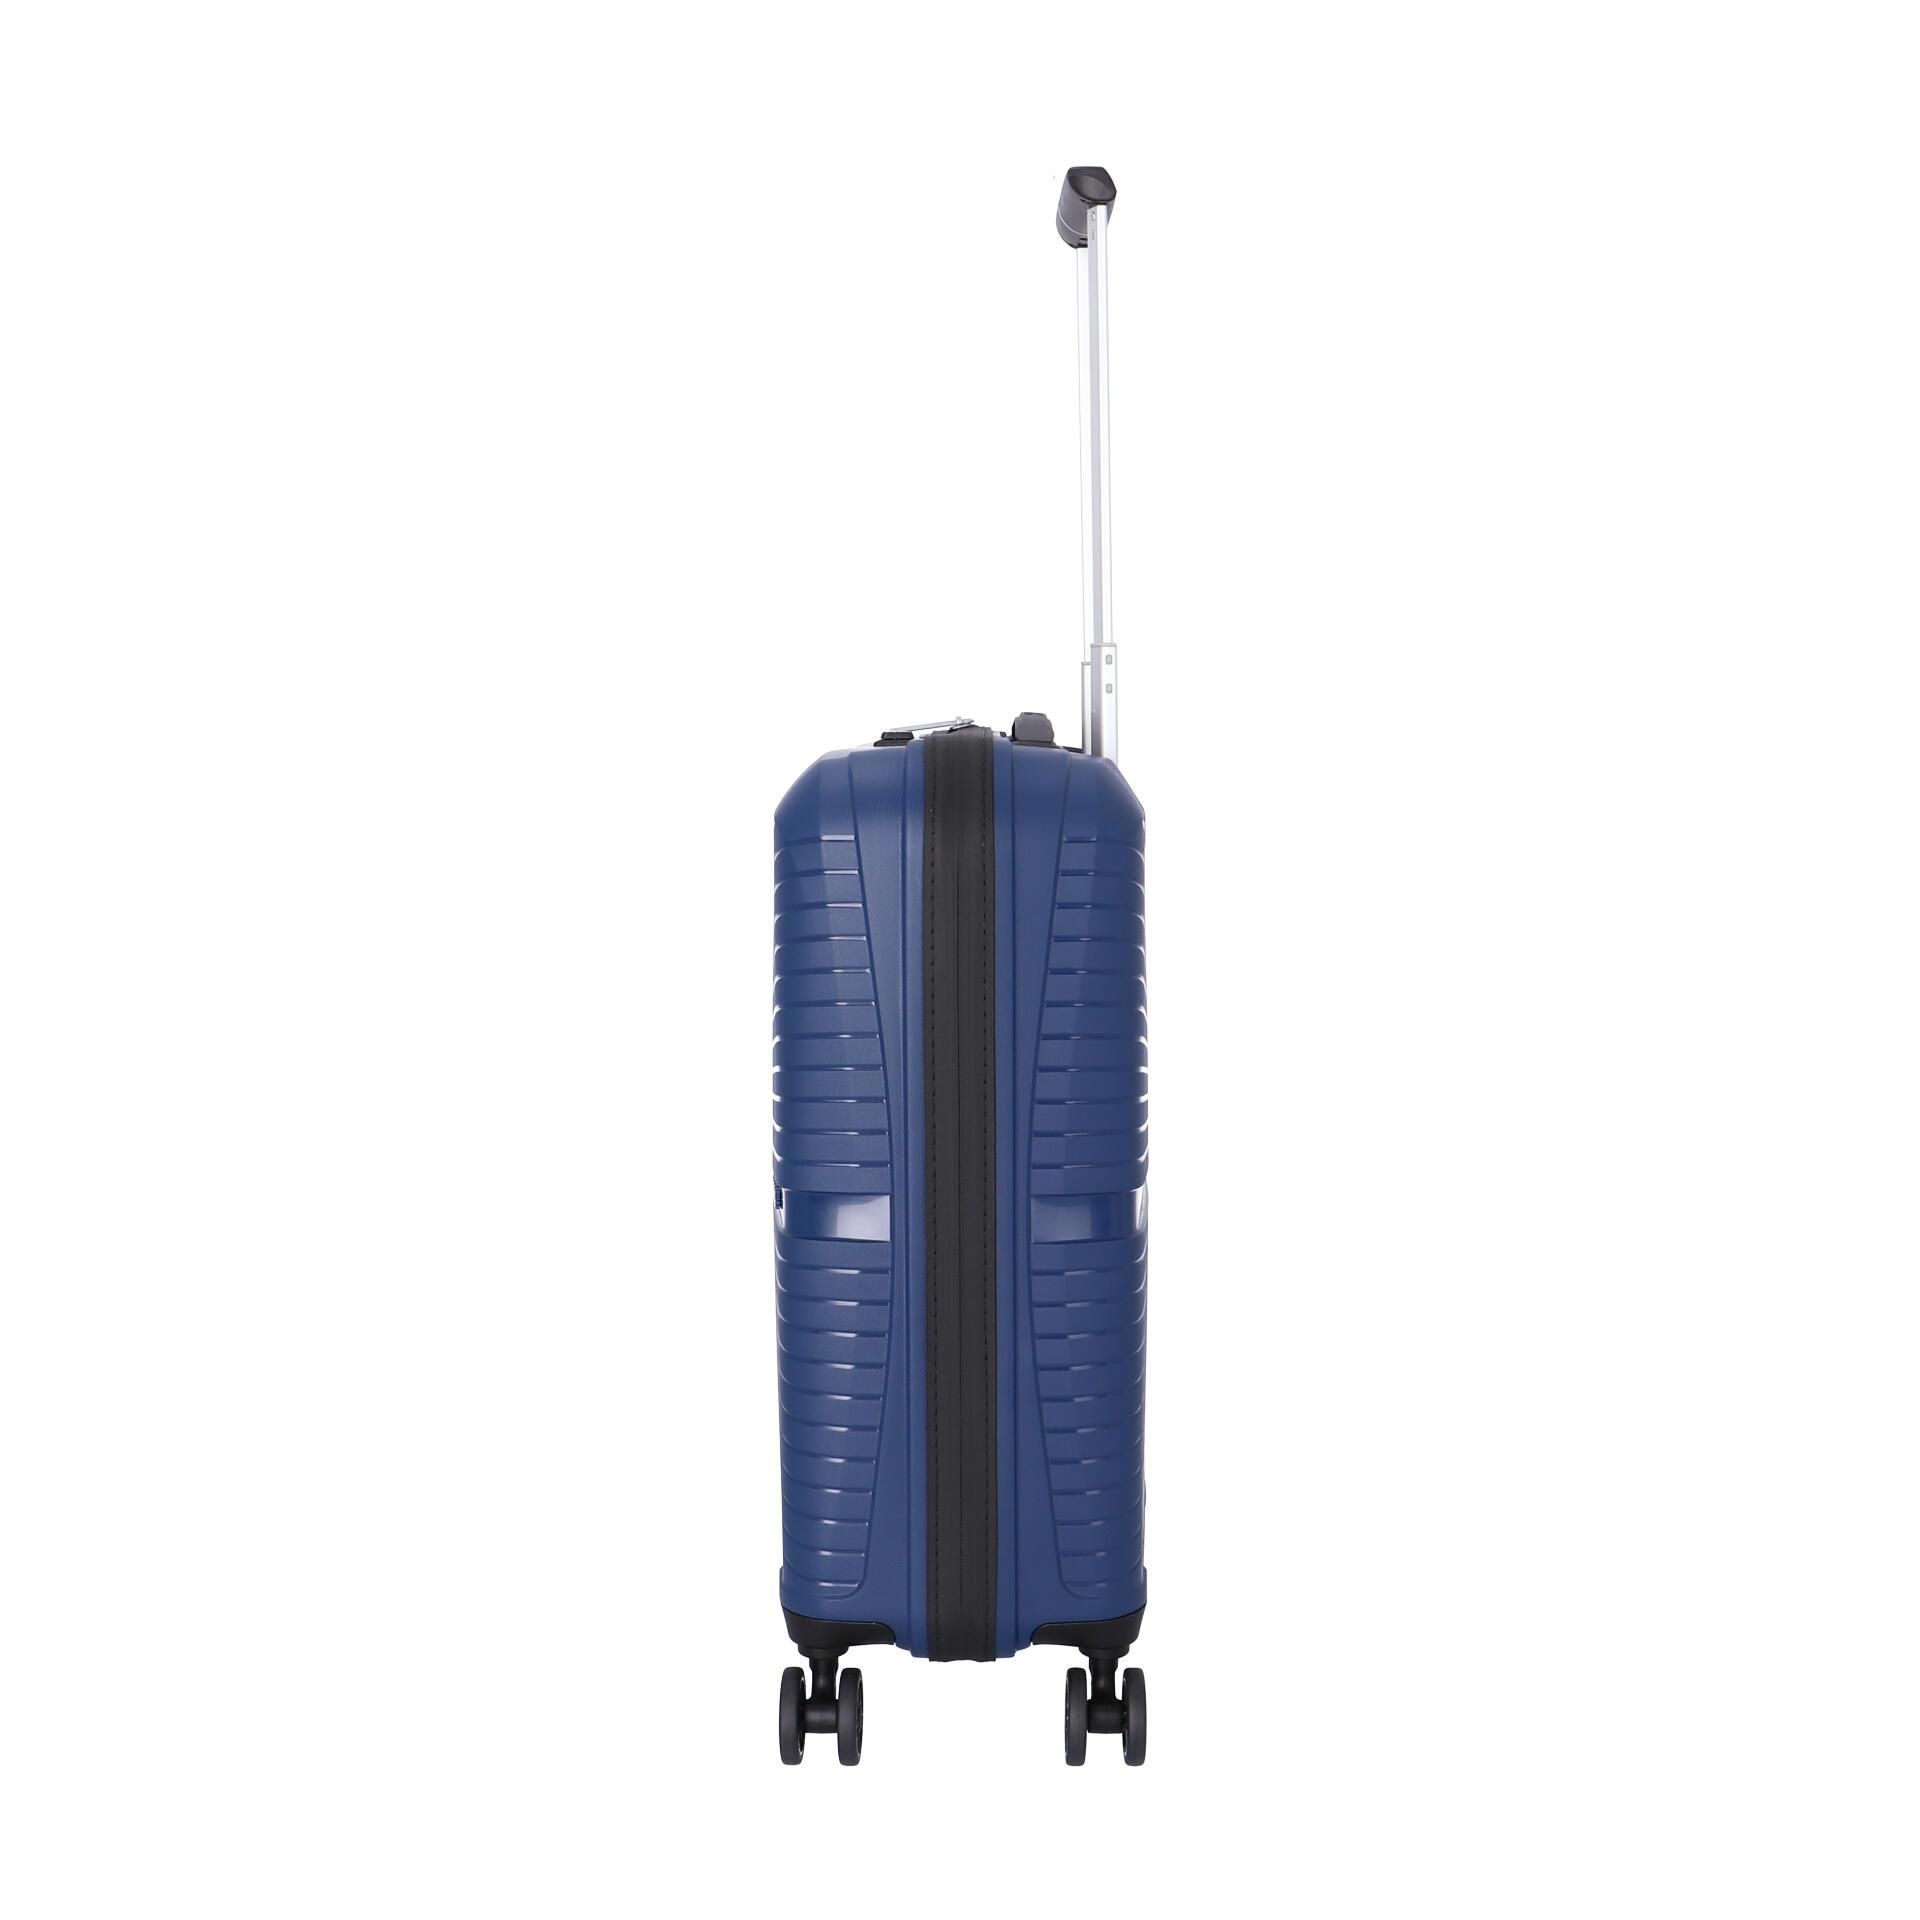 Airconic 4-Rad Trolley 55cm midnightnavy